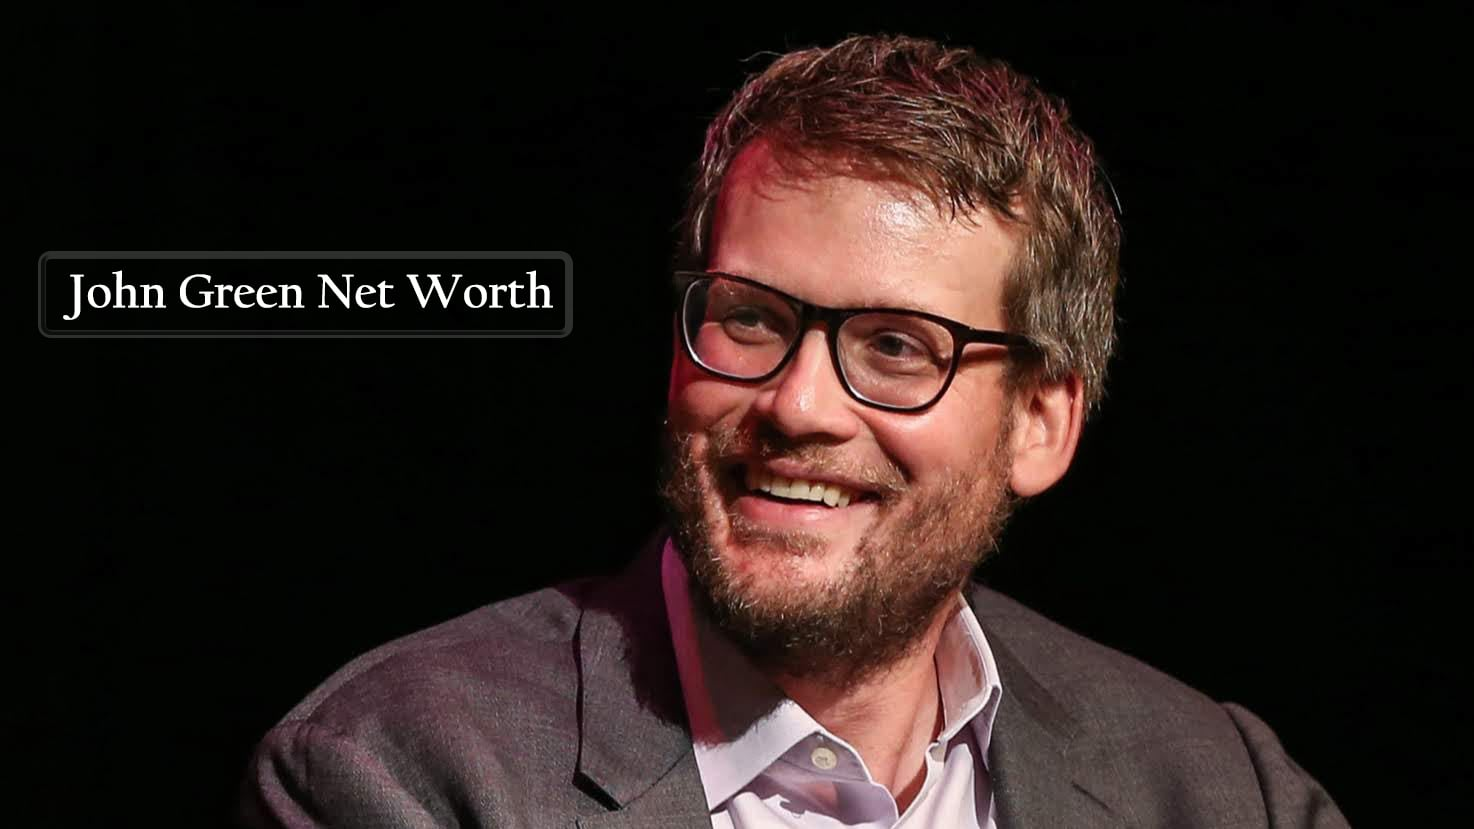 John Green Net worth